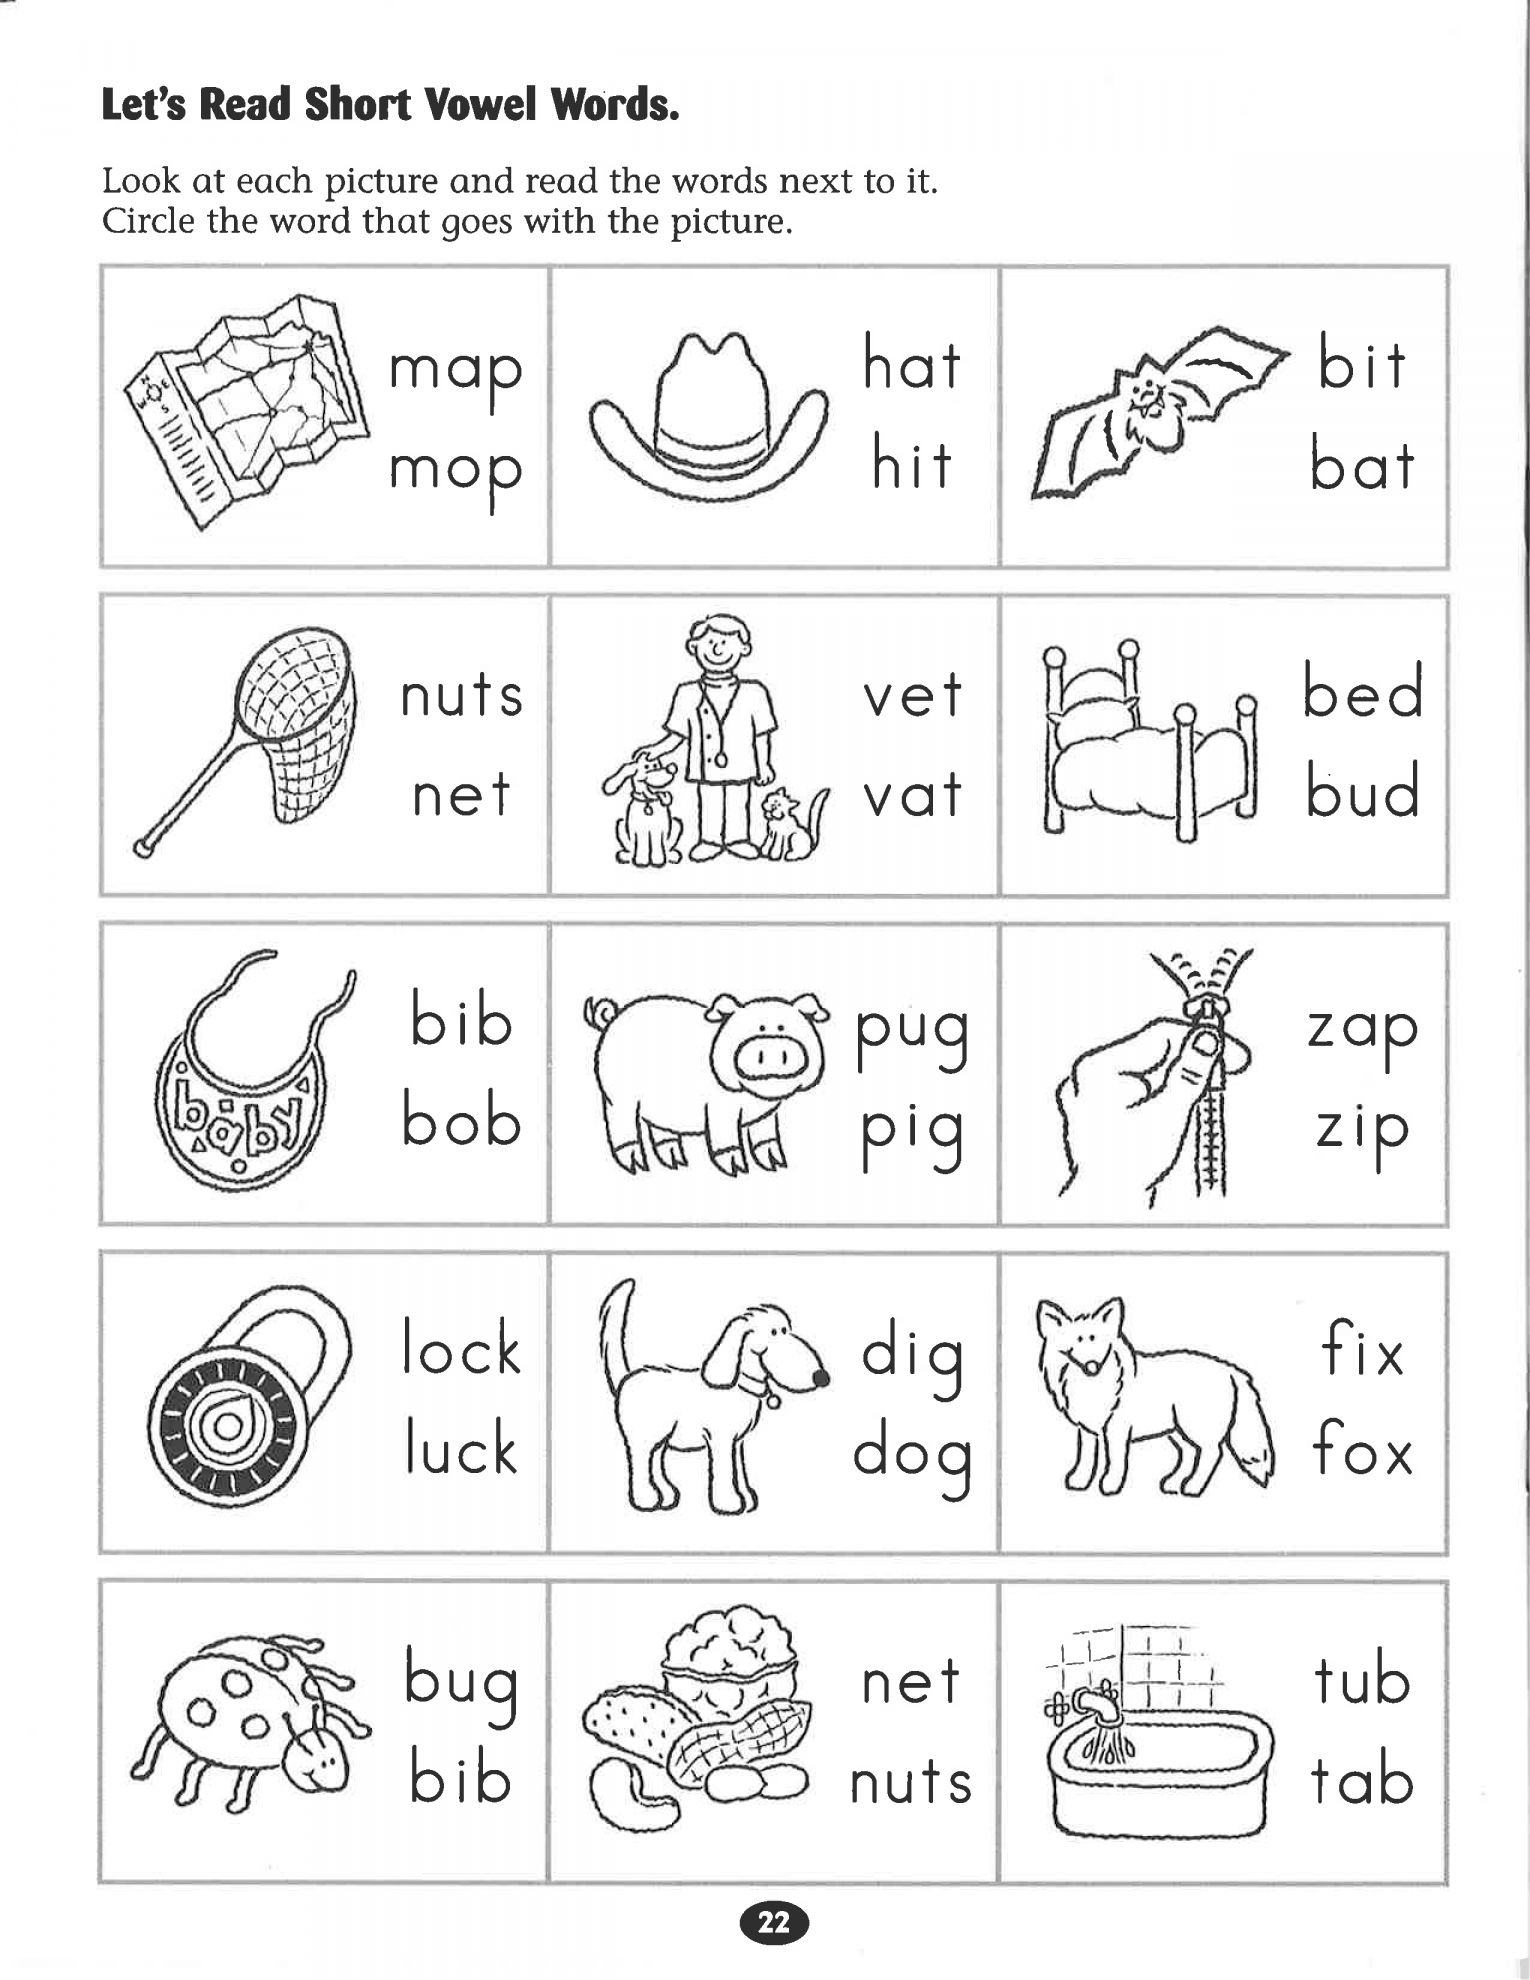 15 Preschool Worksheet With Short Words In